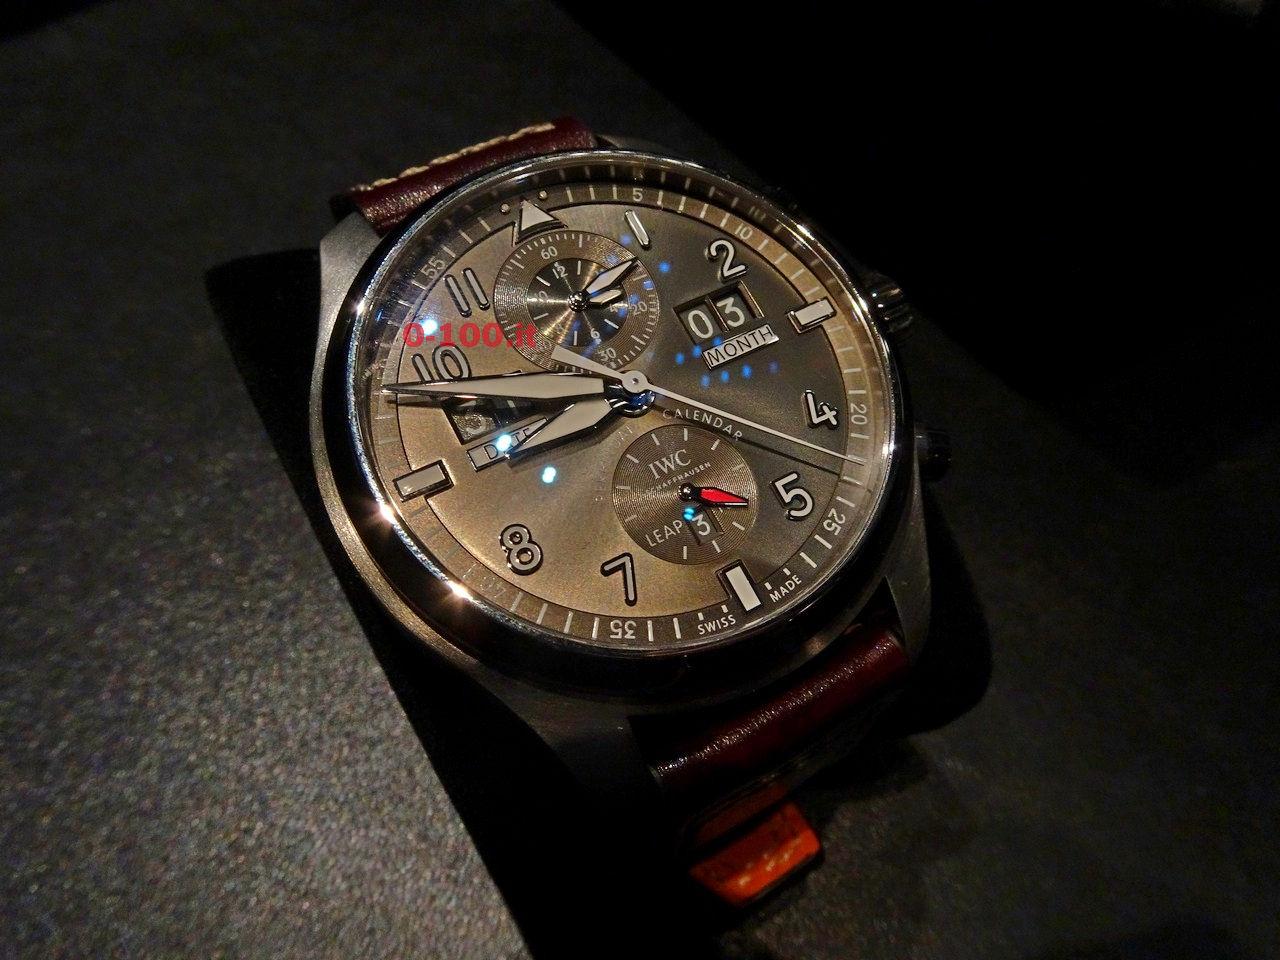 IWC-Big-Pilot-Watch-Perpetual-Calendar-Digital-Date-Month-Spitfire-Ref-379108_1